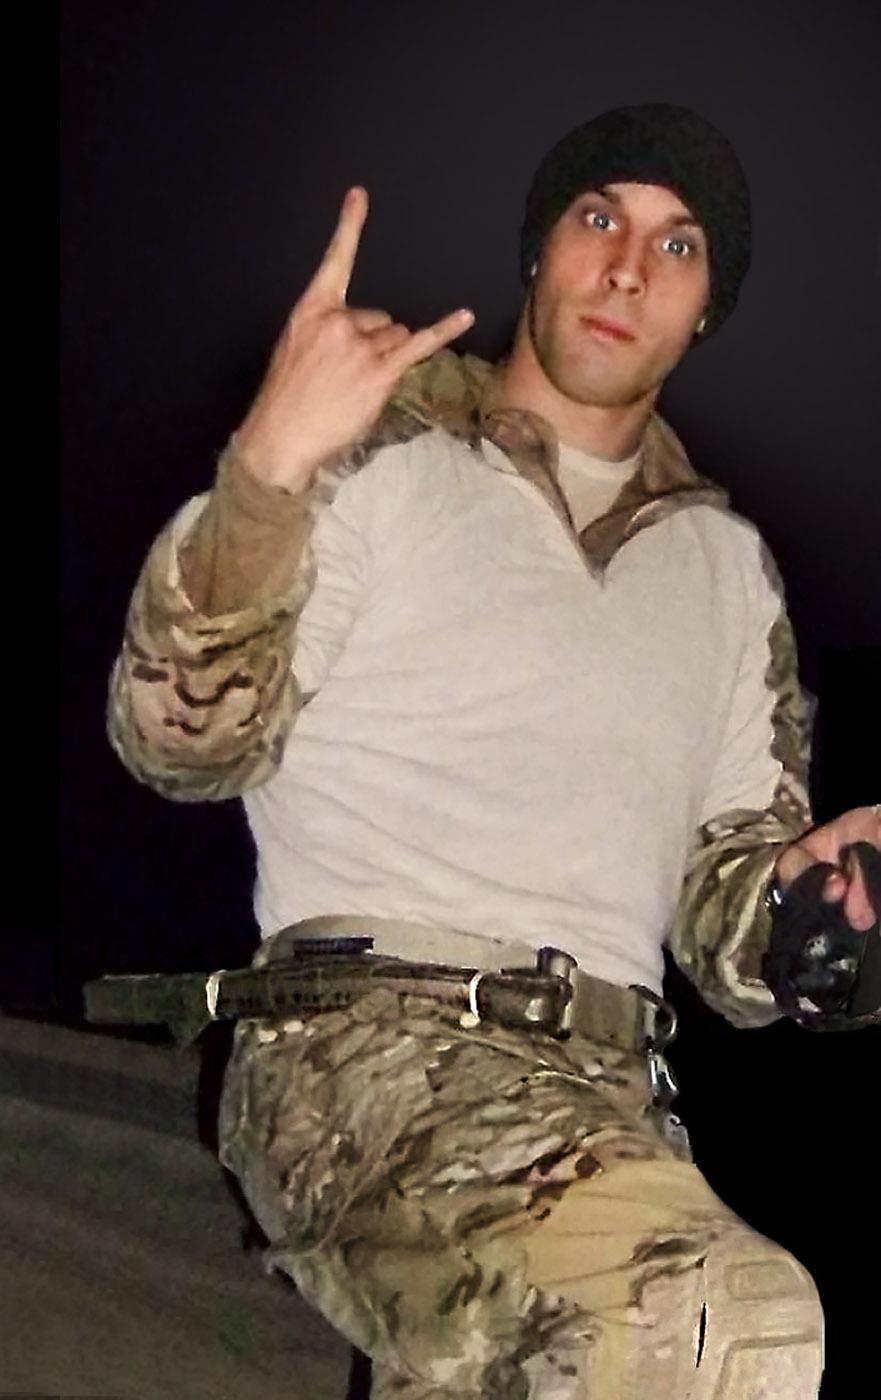 In Honor of Jason Santora - US Army Sergeant Jason A. Santora.Lost on April 23, 2010.